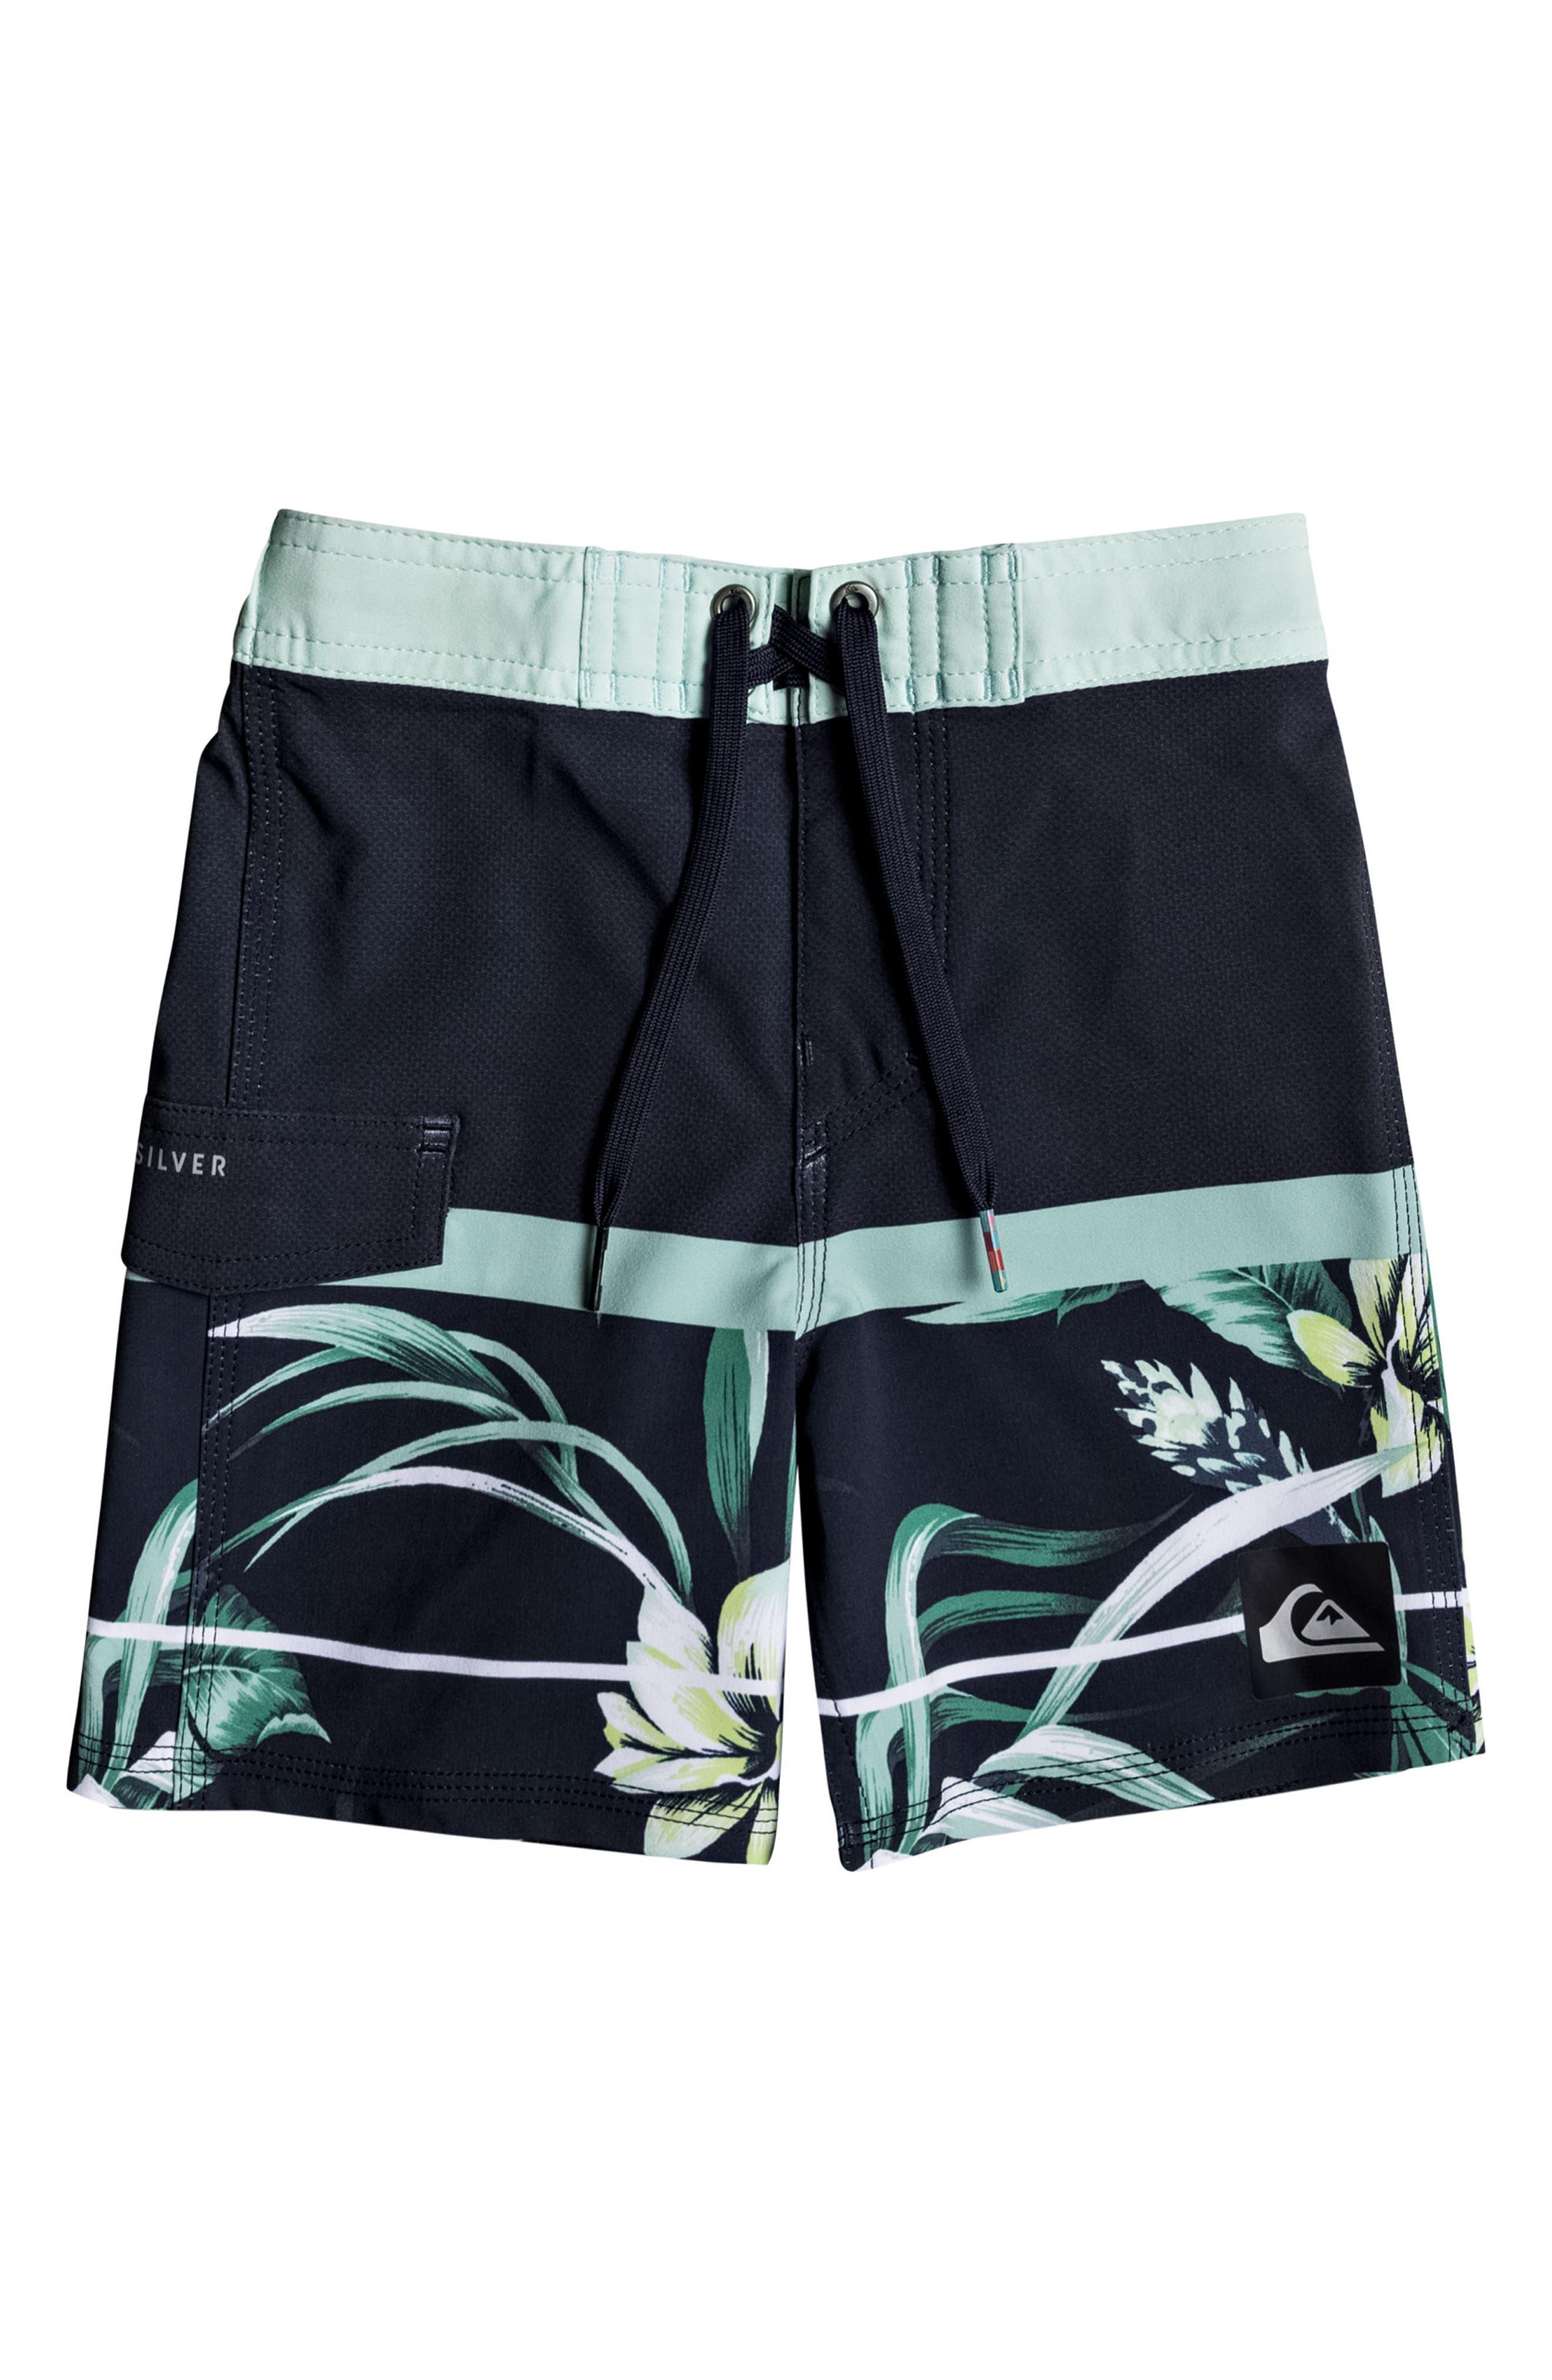 Slab Island Board Shorts,                         Main,                         color, Navy Blazer